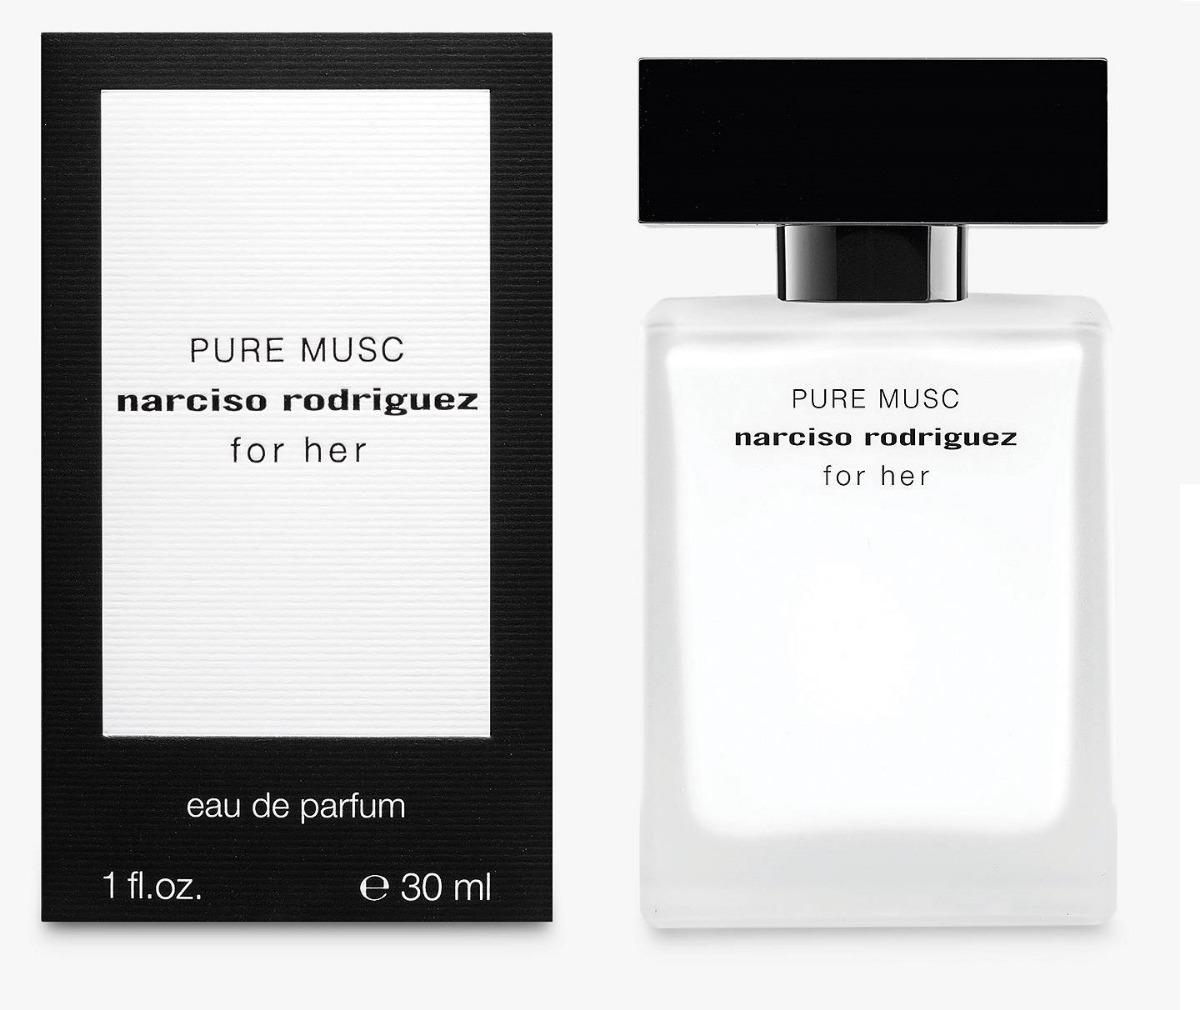 Perfume: Narciso Rodriguez Pure Musc